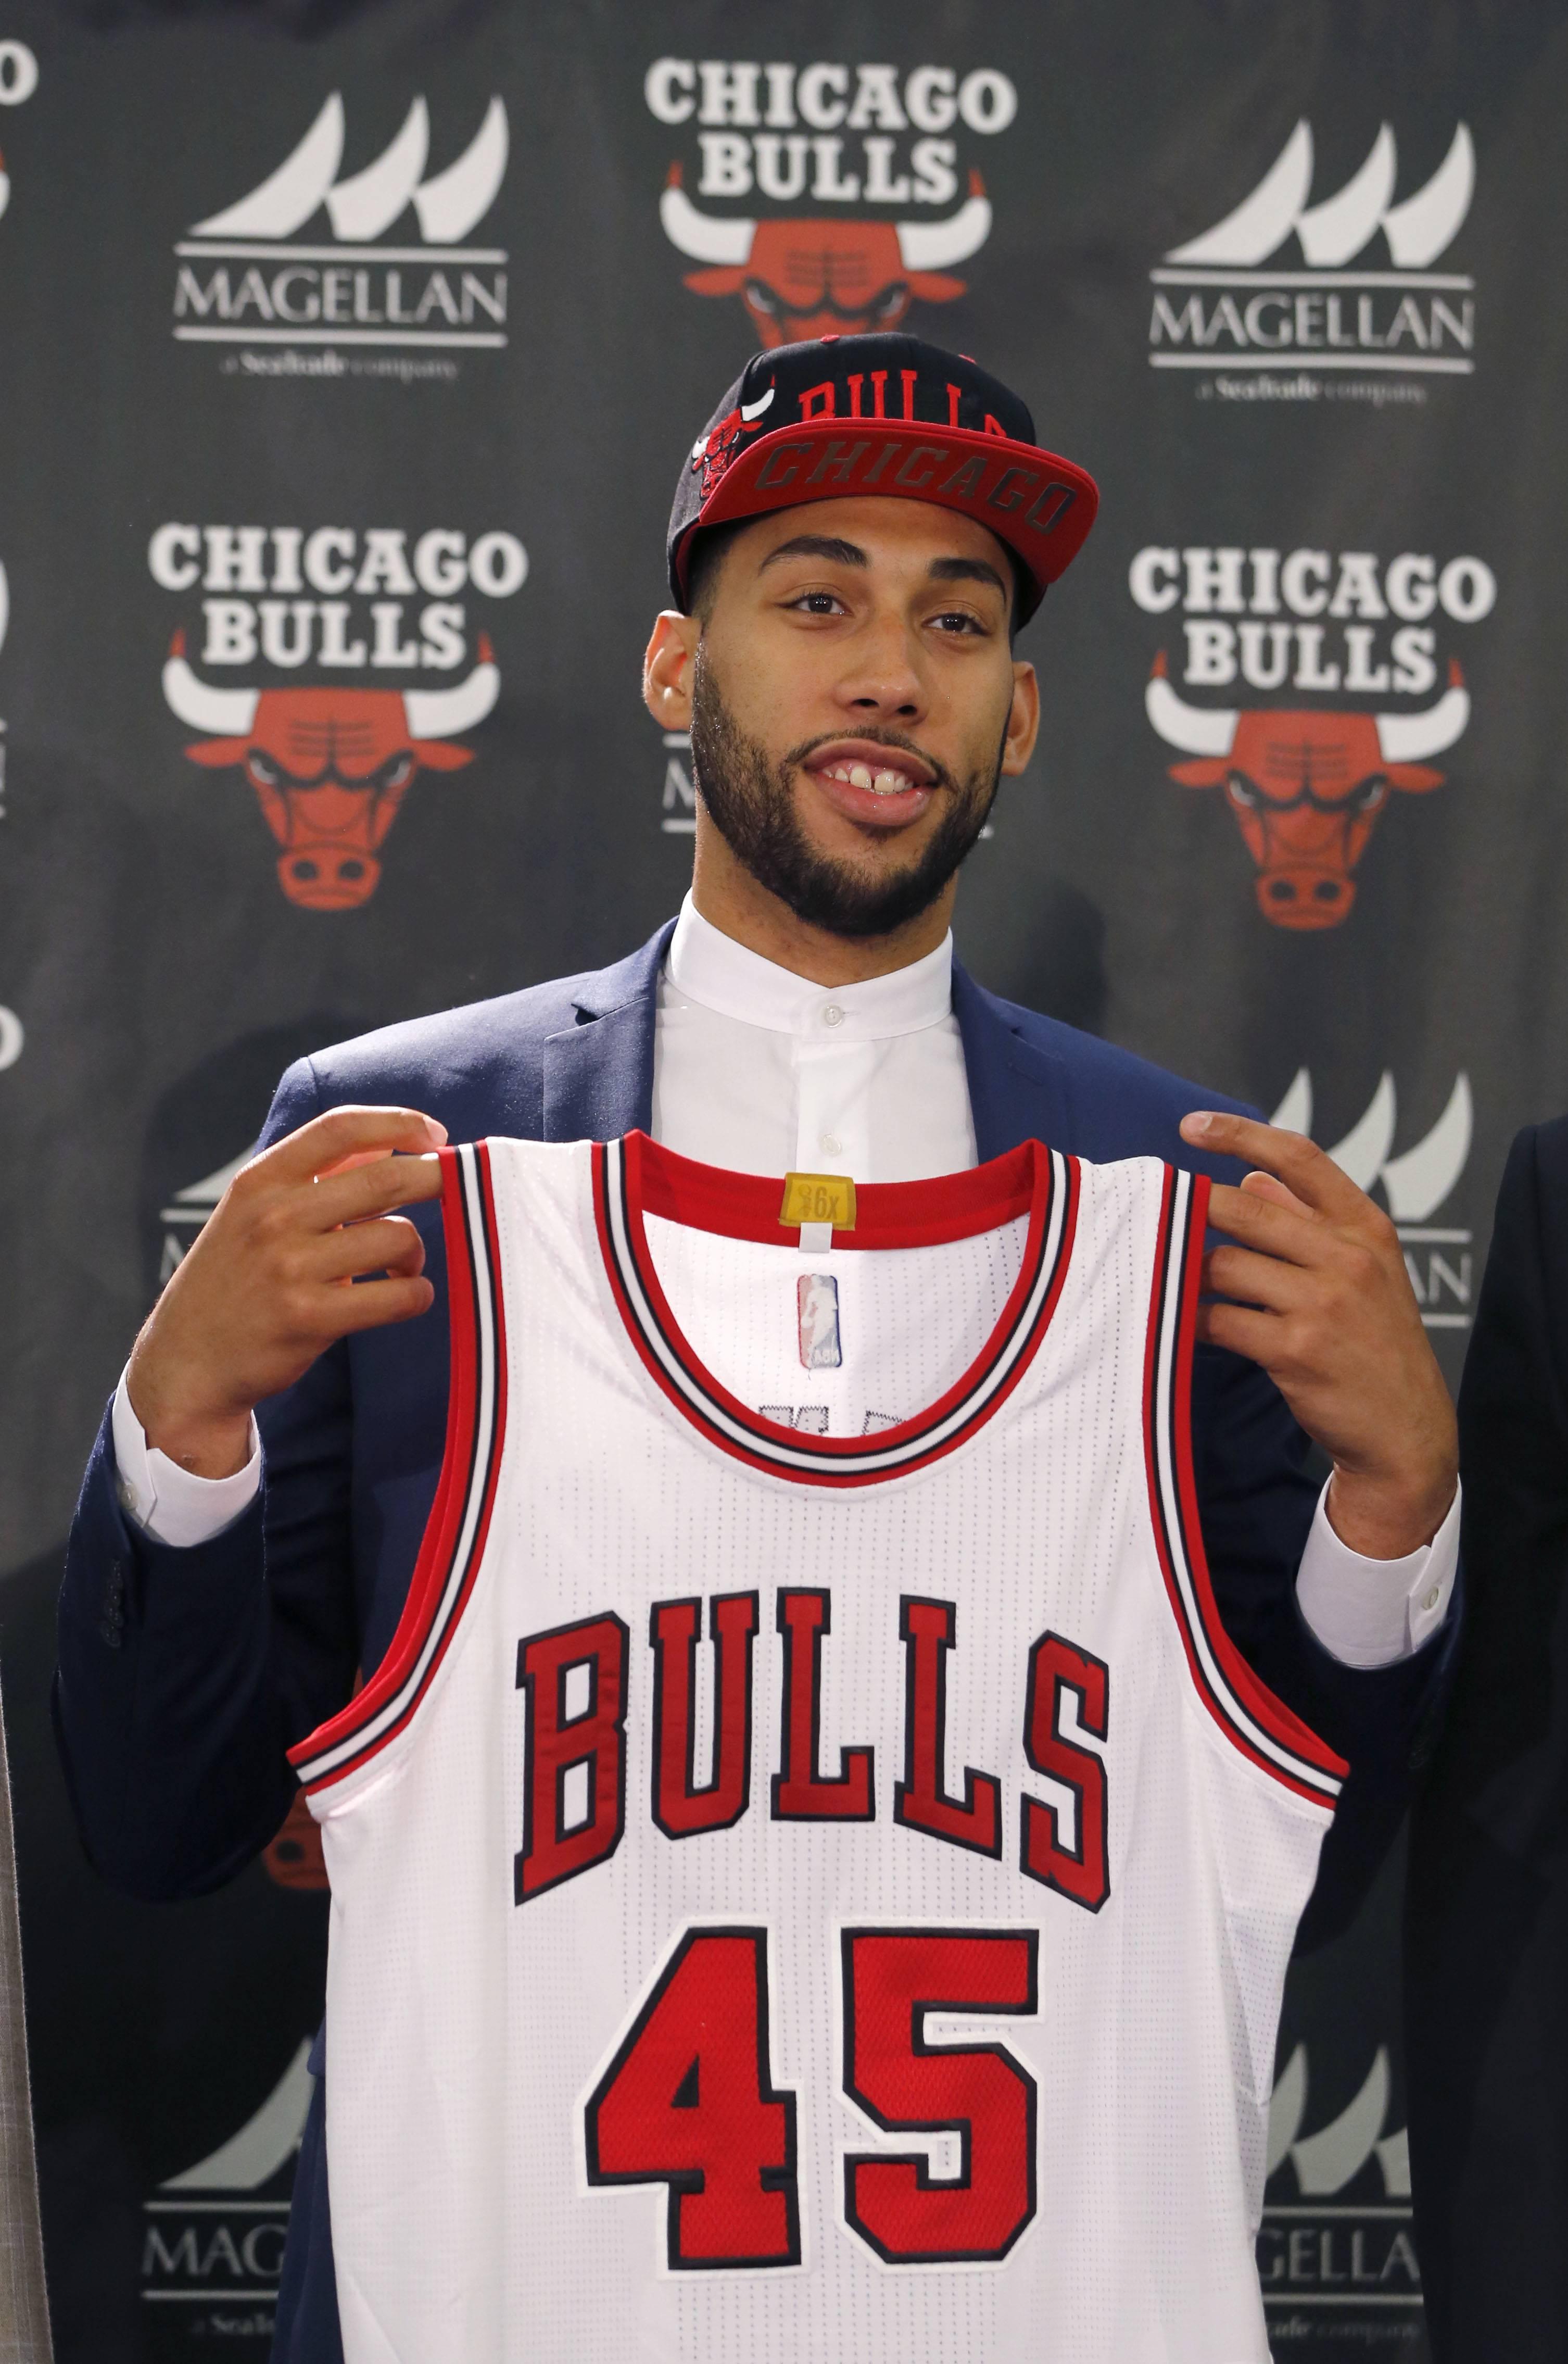 Chicago Bullsu0027 First Round Draft Pick Denzel Valentine, From Michigan State  University, Holds